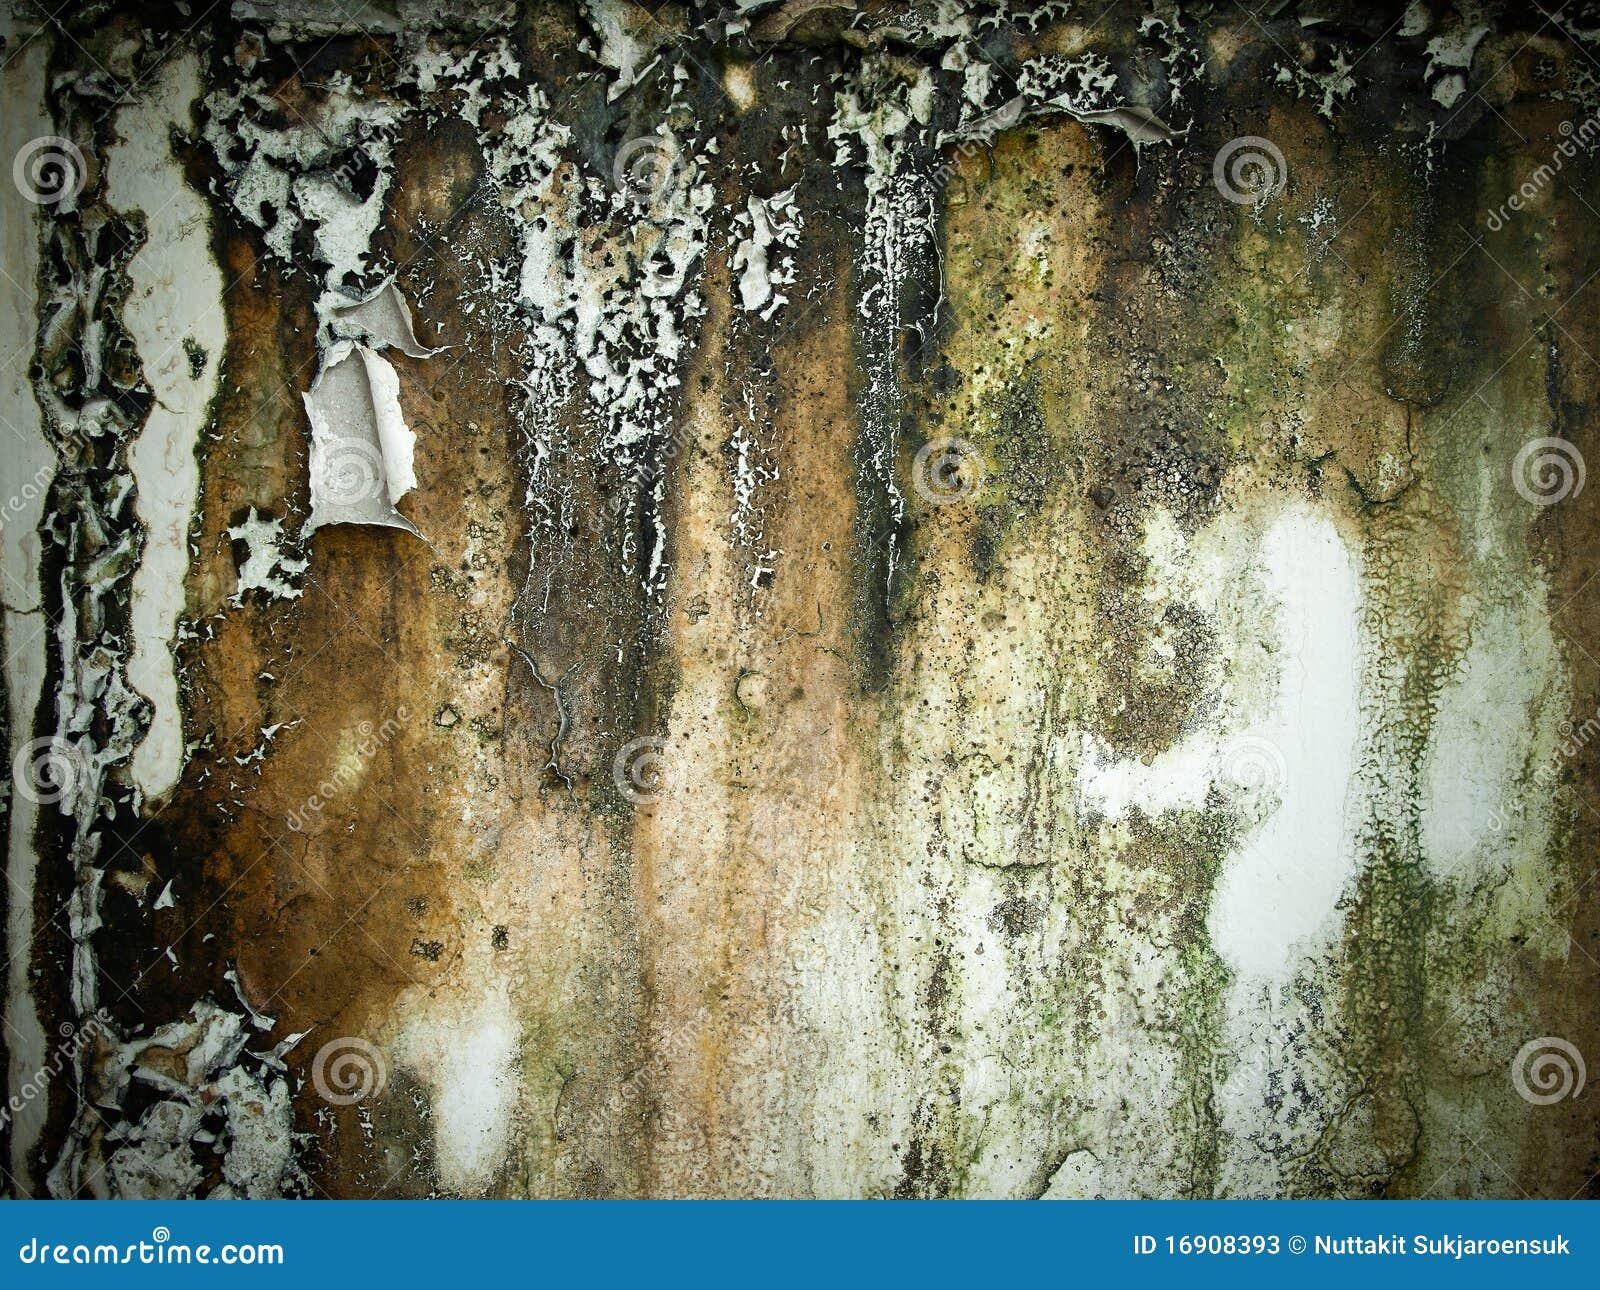 vieux mur humide rugueux photos stock image 16908393. Black Bedroom Furniture Sets. Home Design Ideas